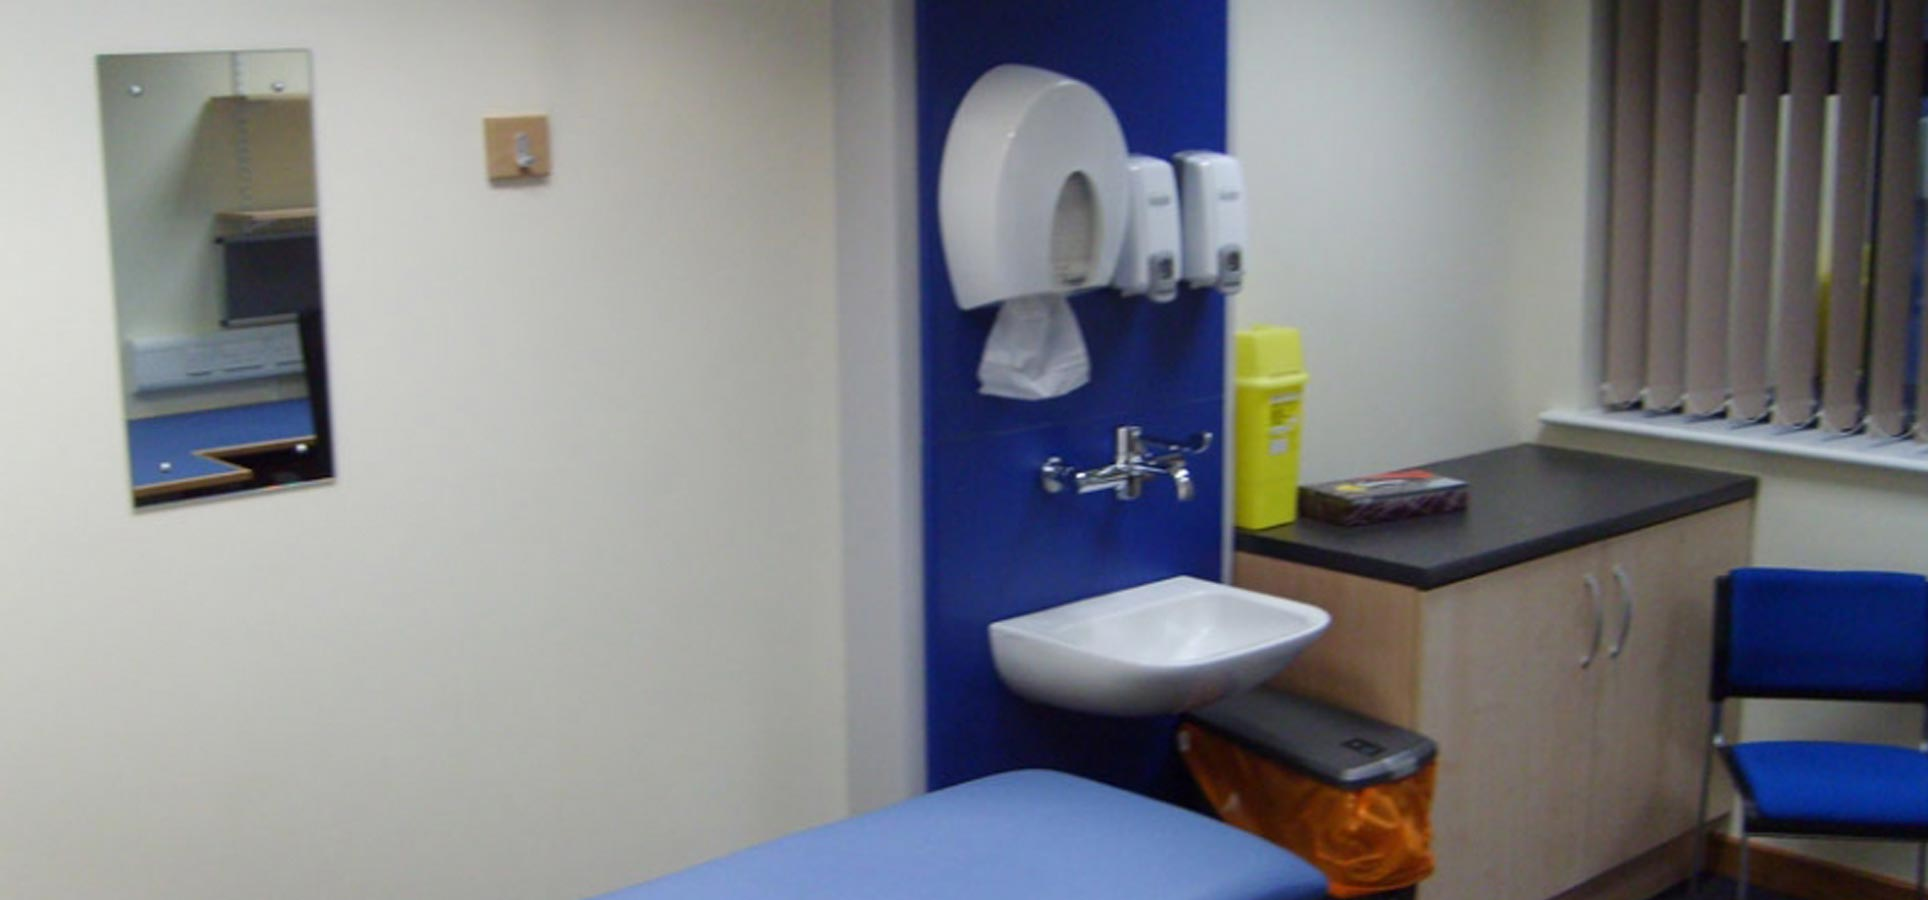 Primary Care Centres, Jessops Construction Ltd